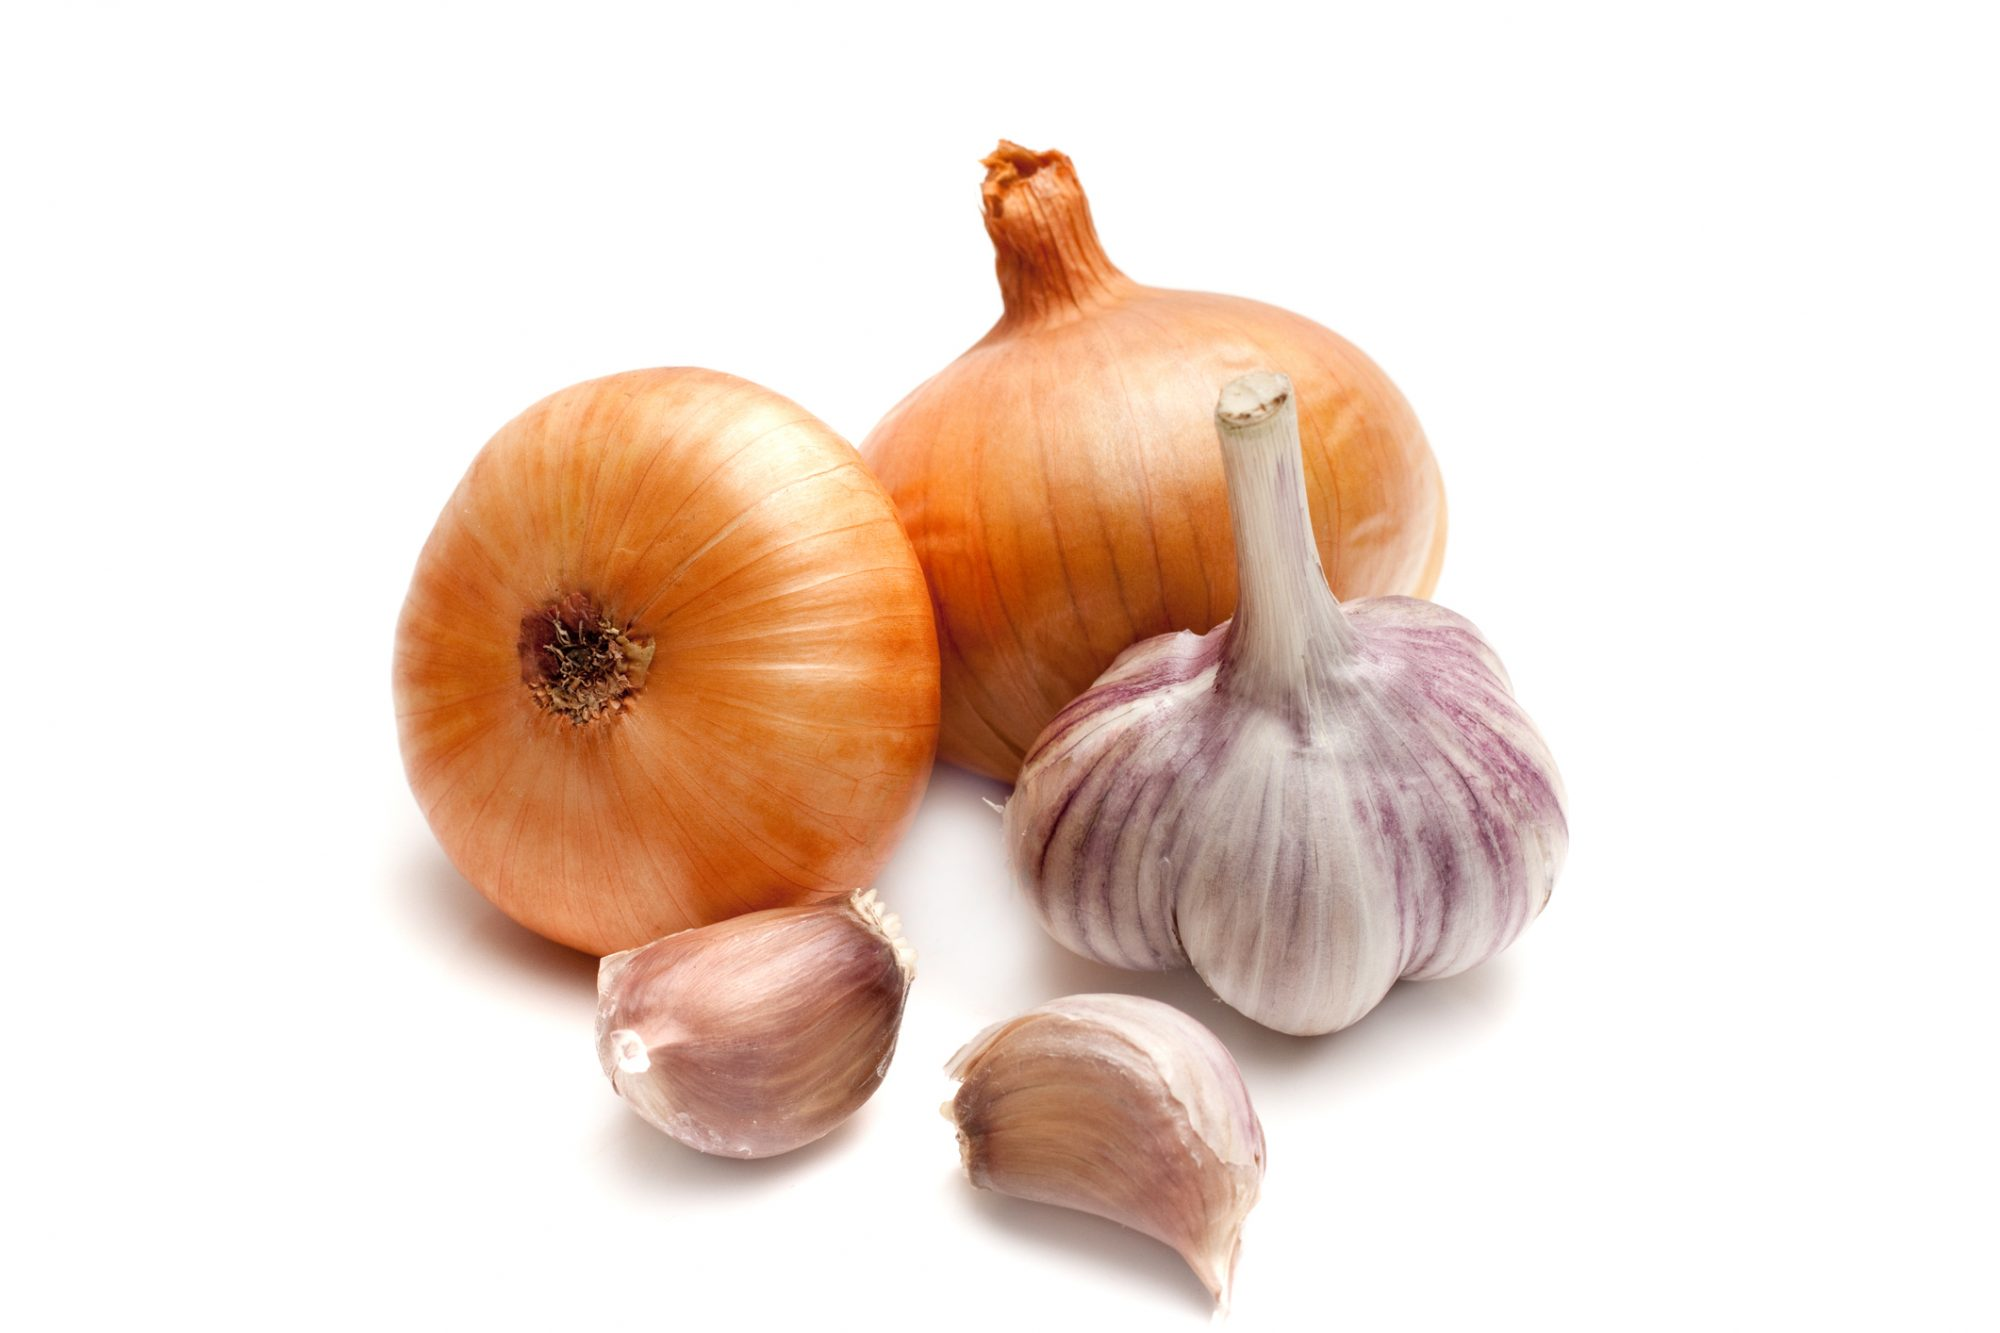 getty-onion-and-garlic-image